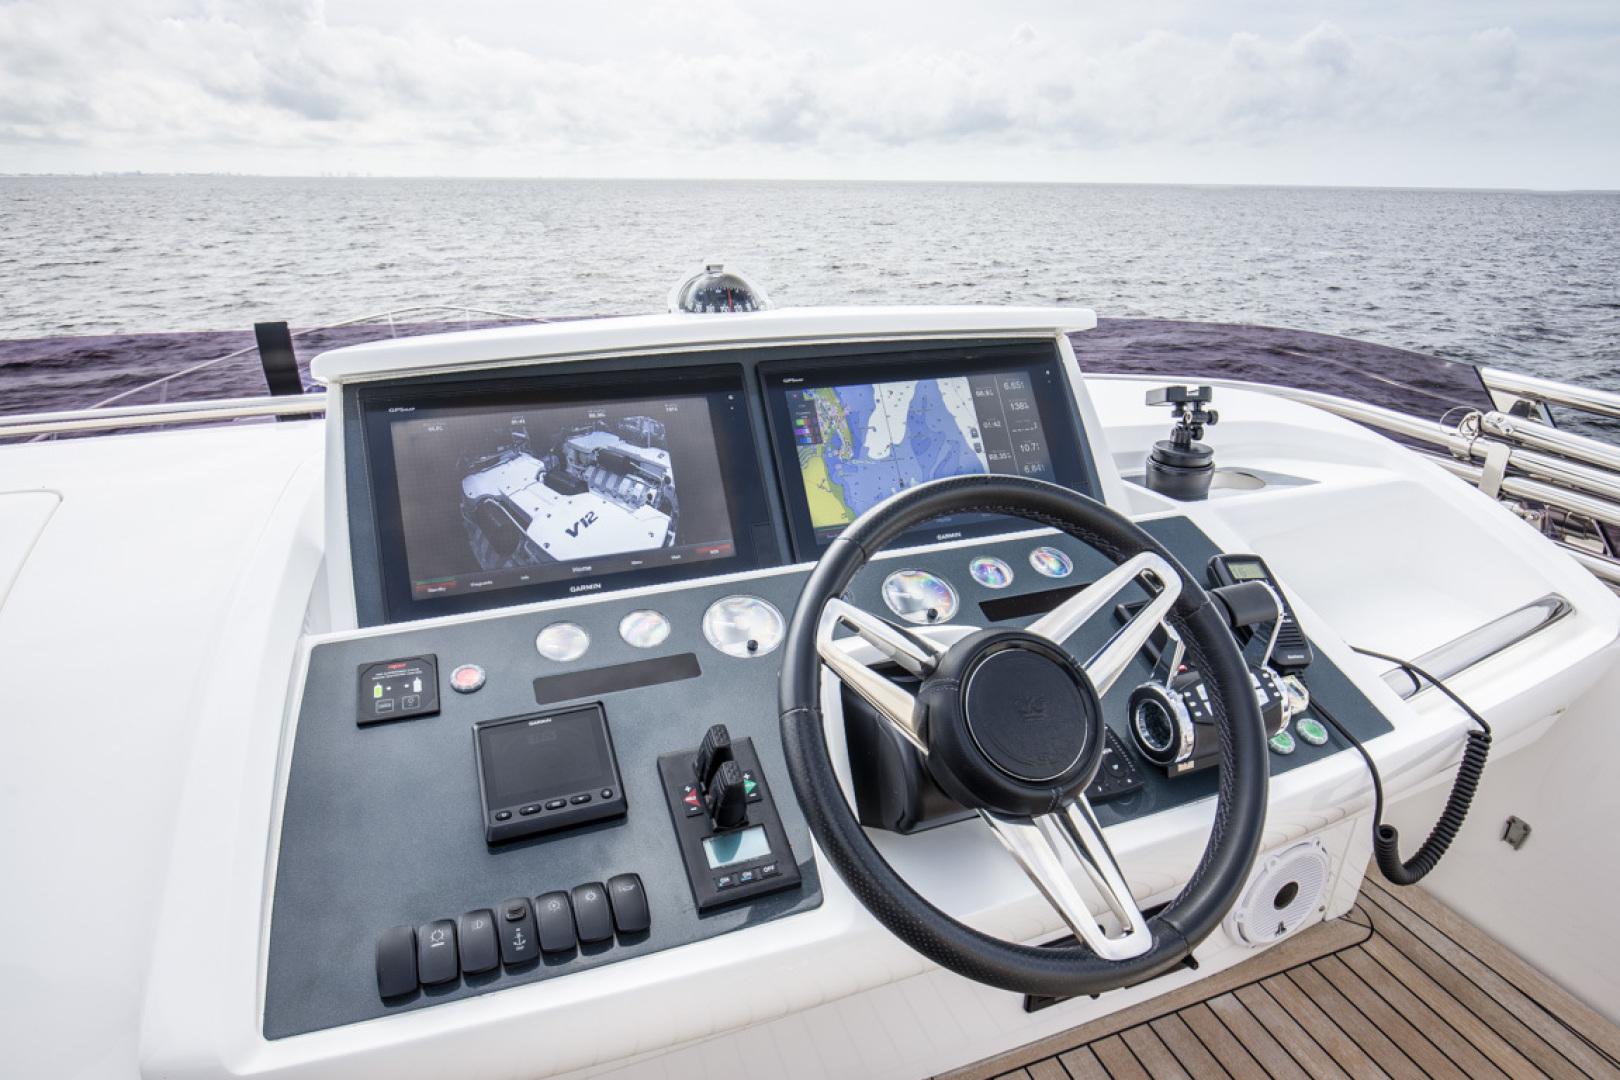 Princess-S65 2019-Paragon Cape Coral-Florida-United States-2019 65 Princess S65-Paragon-Electronics-1510314 | Thumbnail